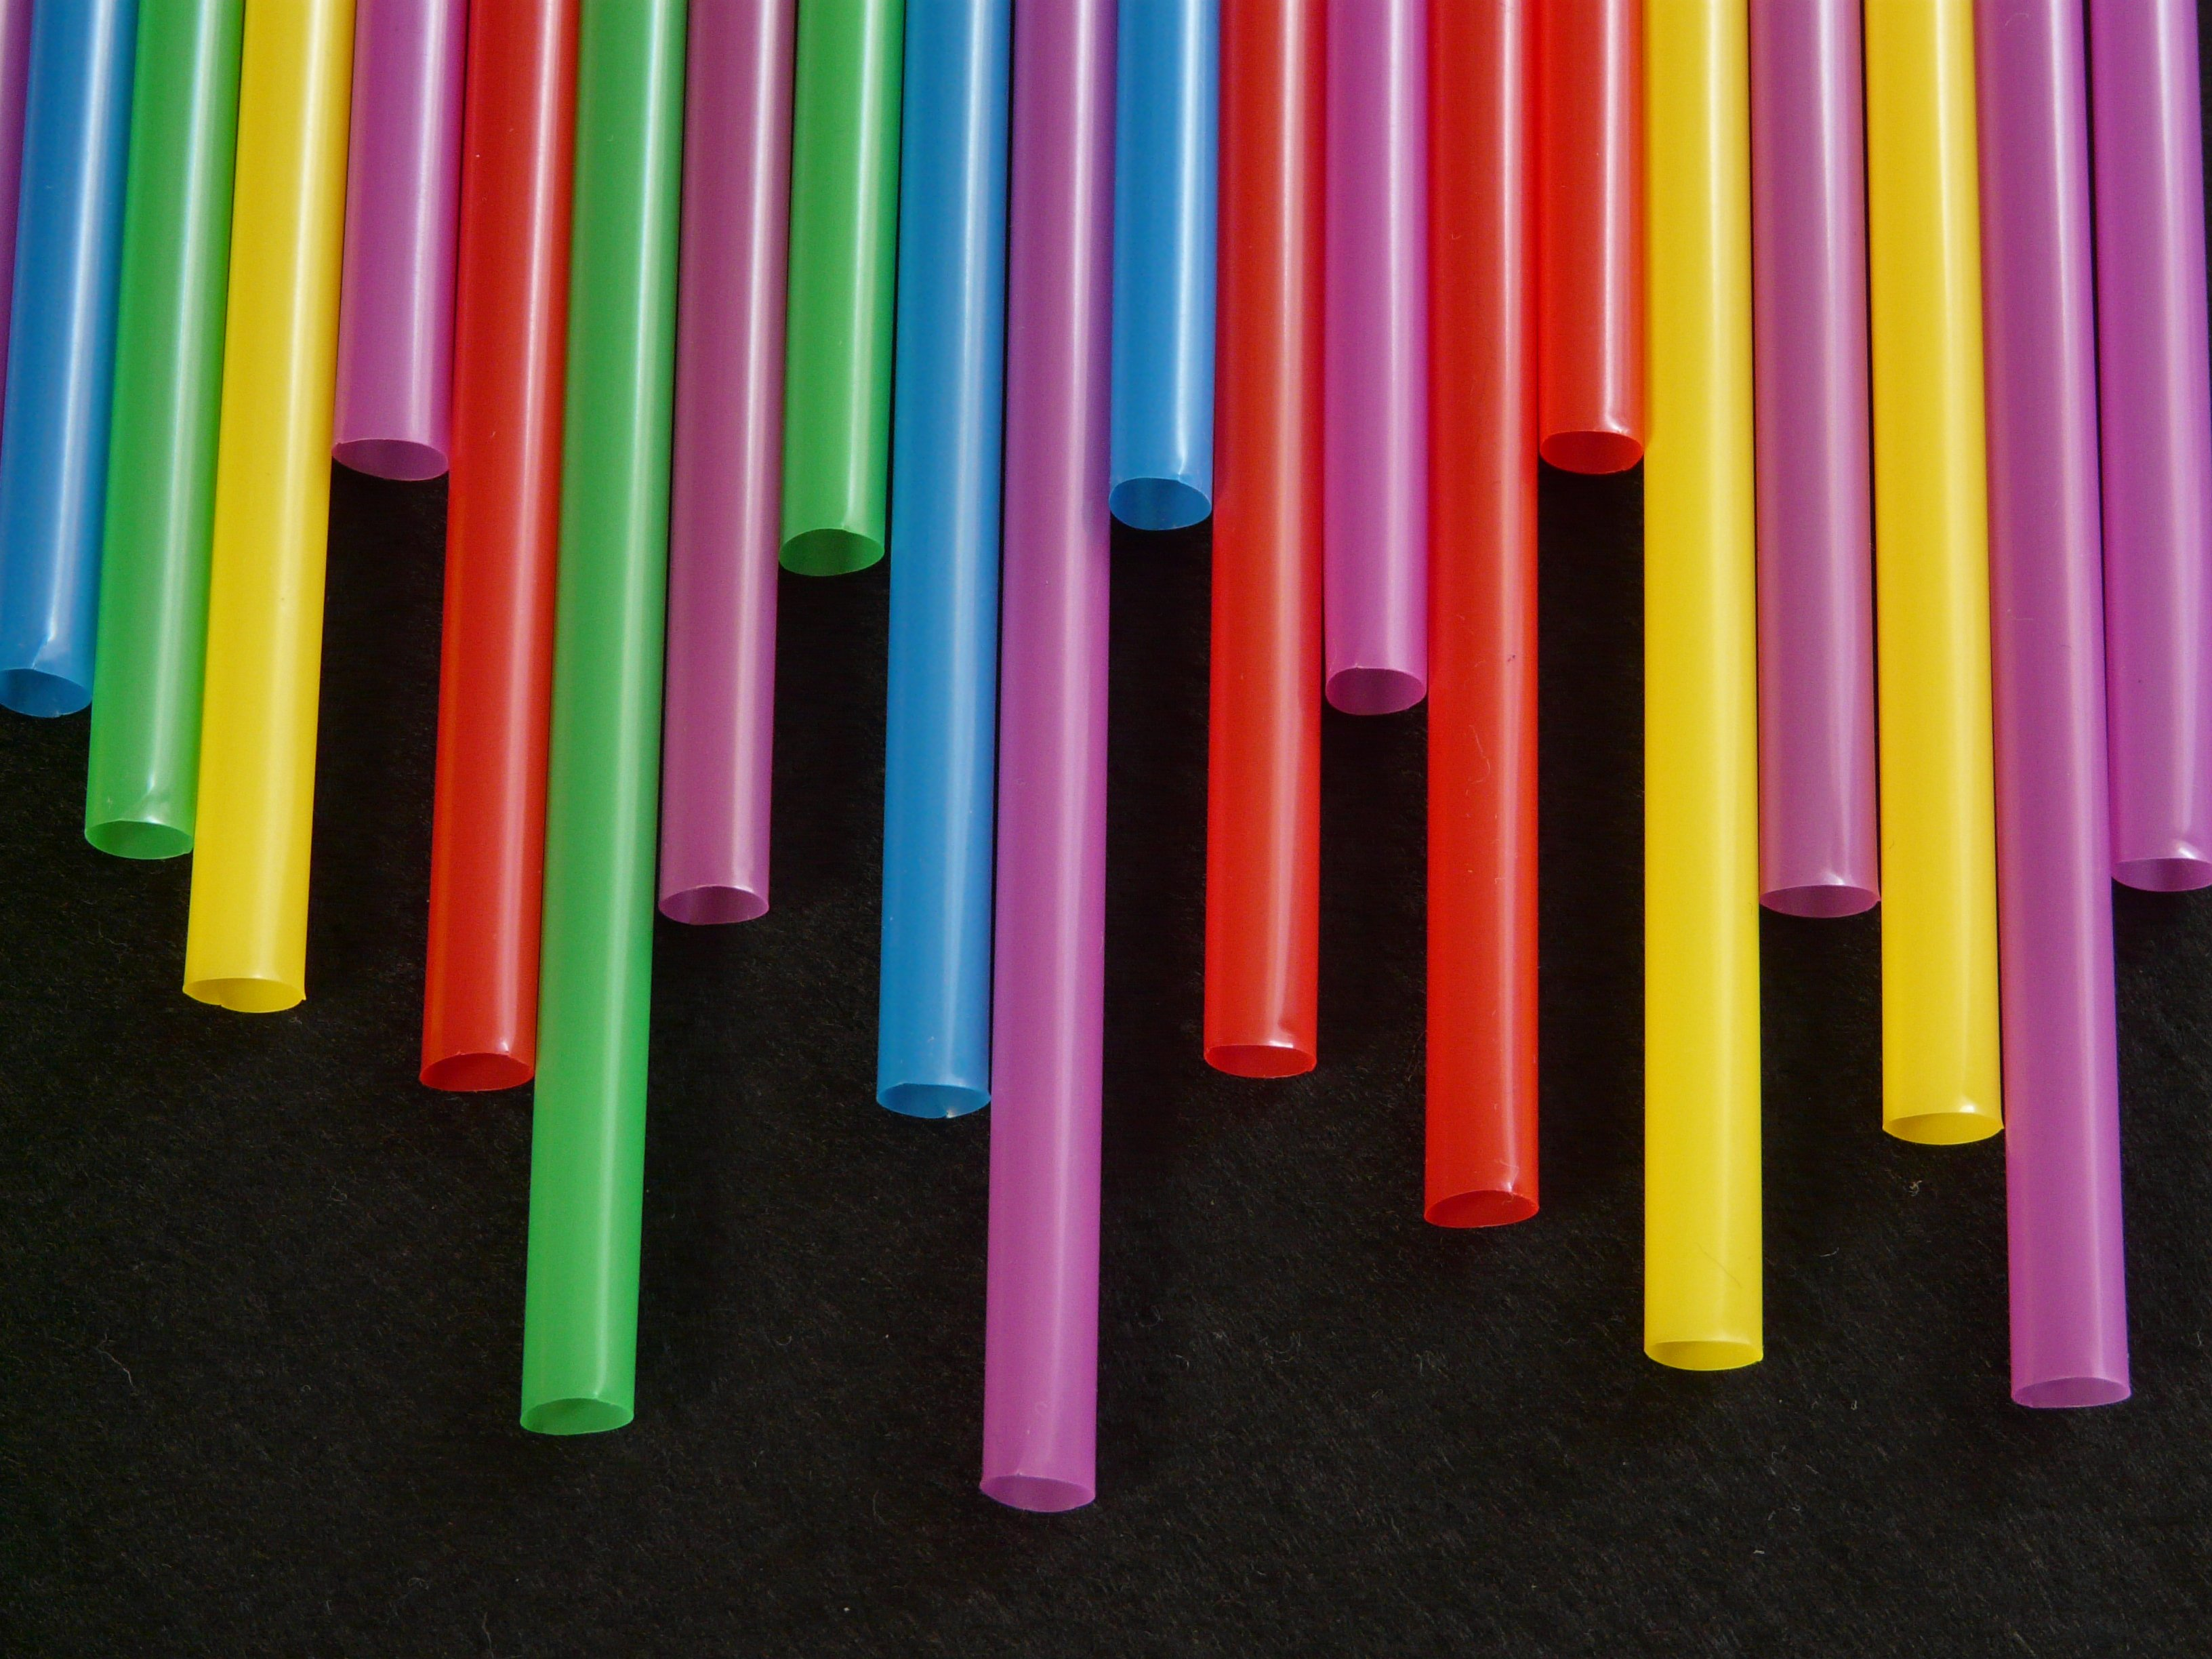 straws-tube-plastic-colorful-65612